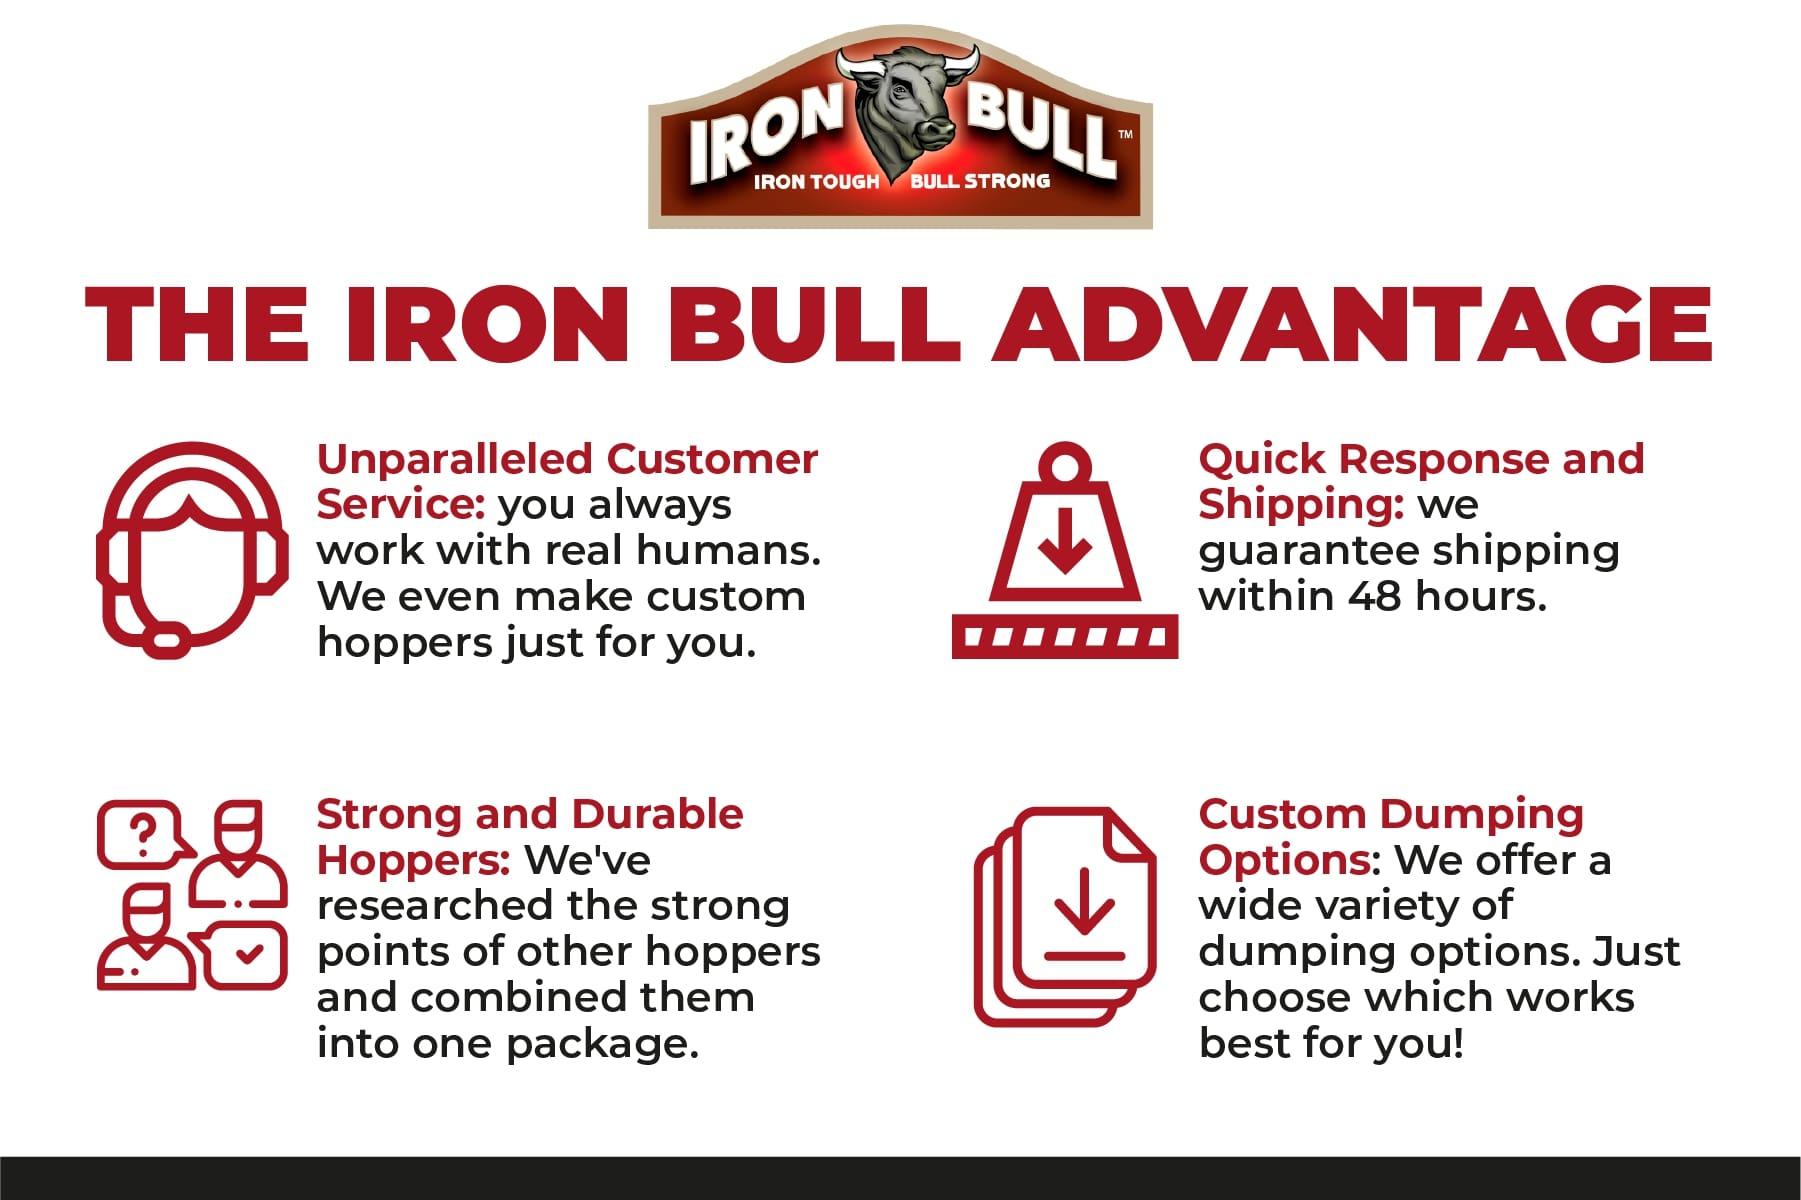 The Iron Bull advantage